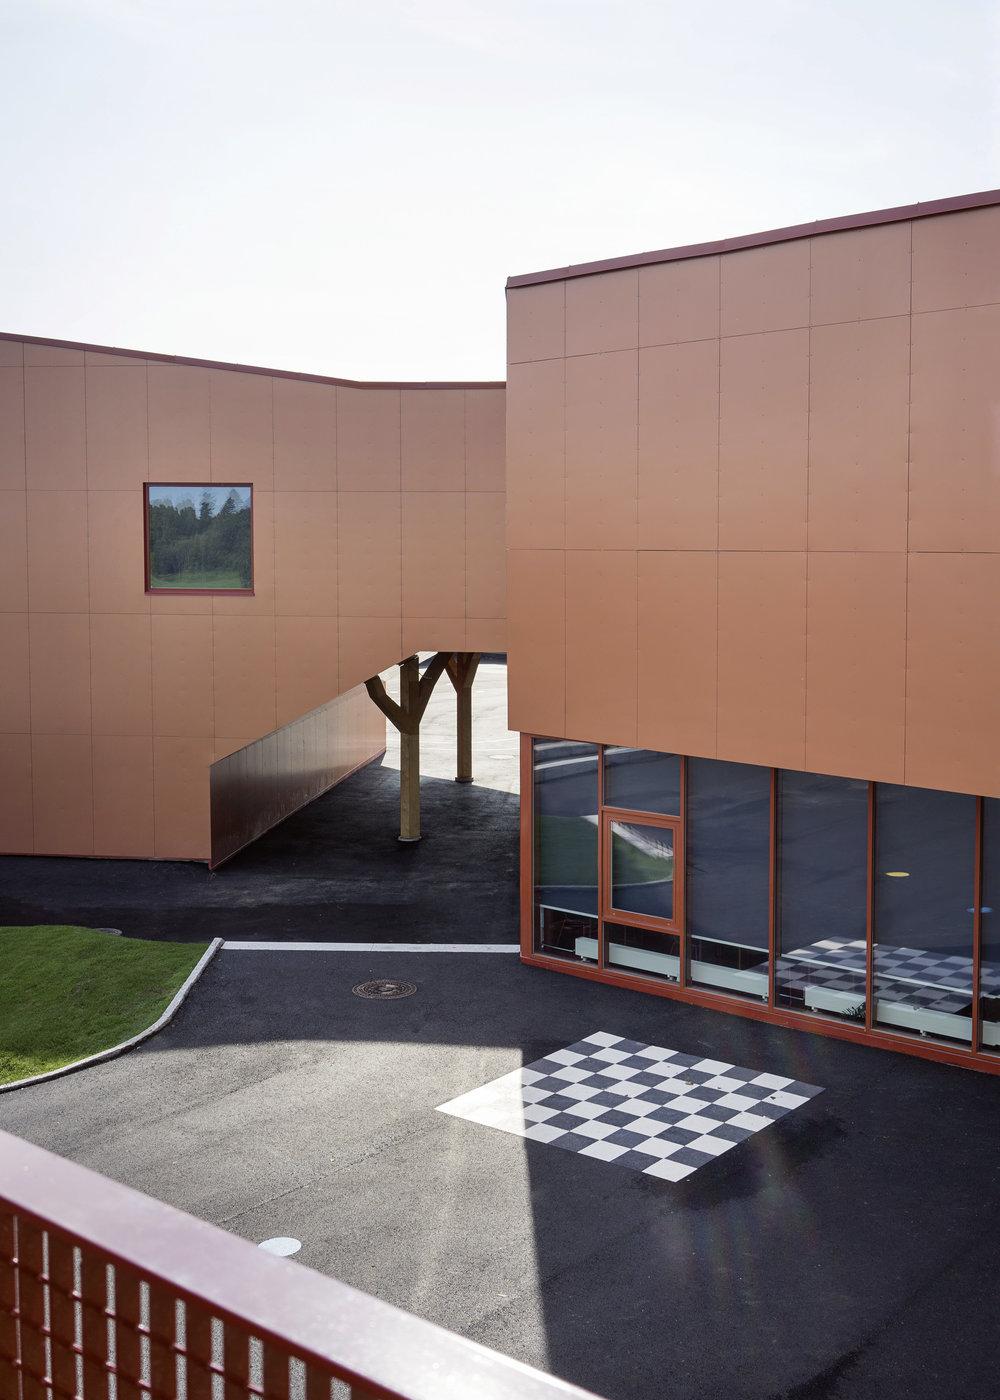 Hebekk skole_Fasade 05.jpg